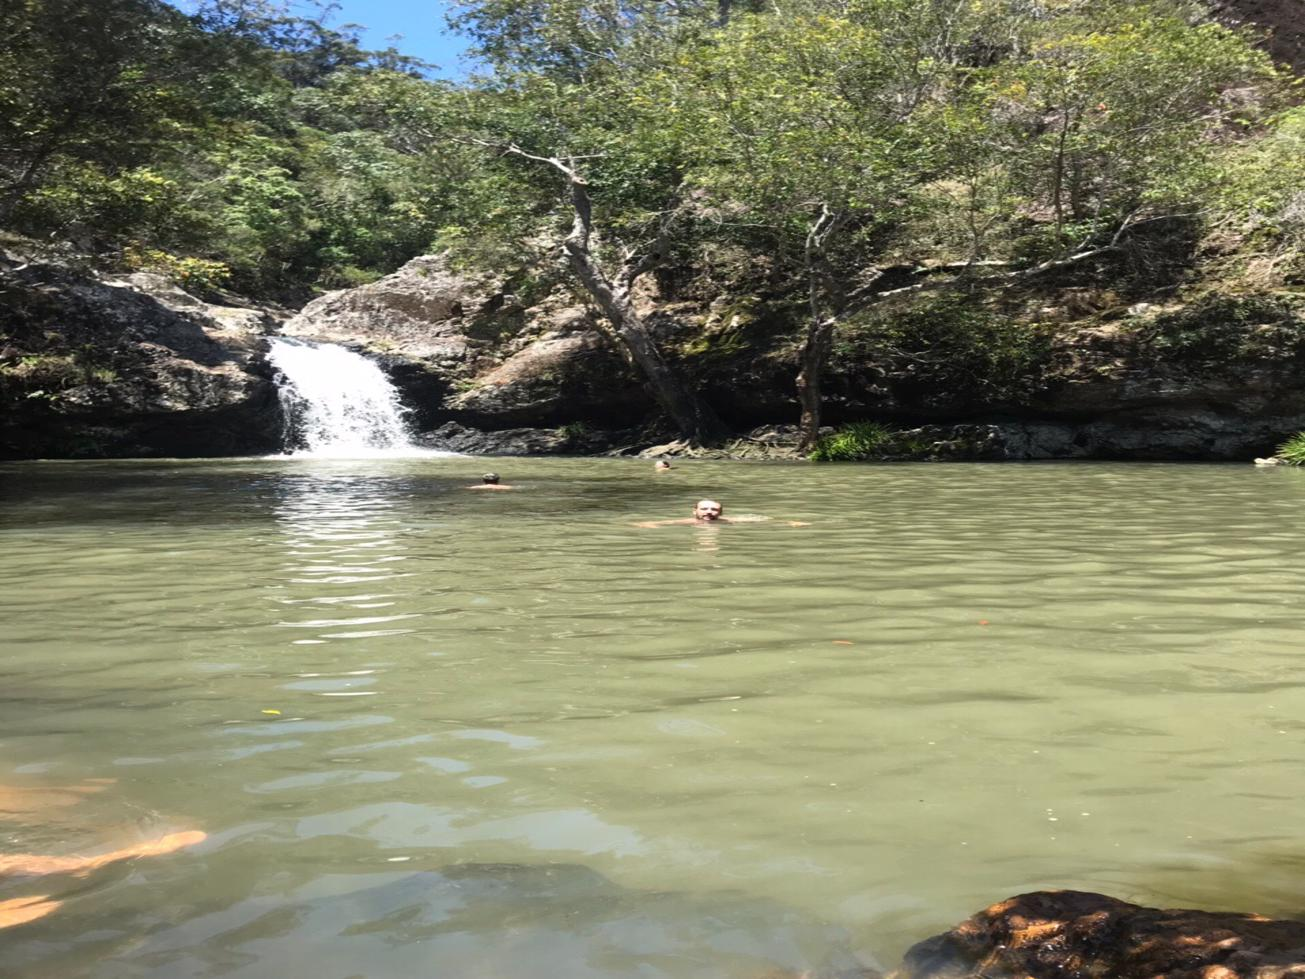 Trail Image for Kondalilla National Park: Kondalilla Rock Pools